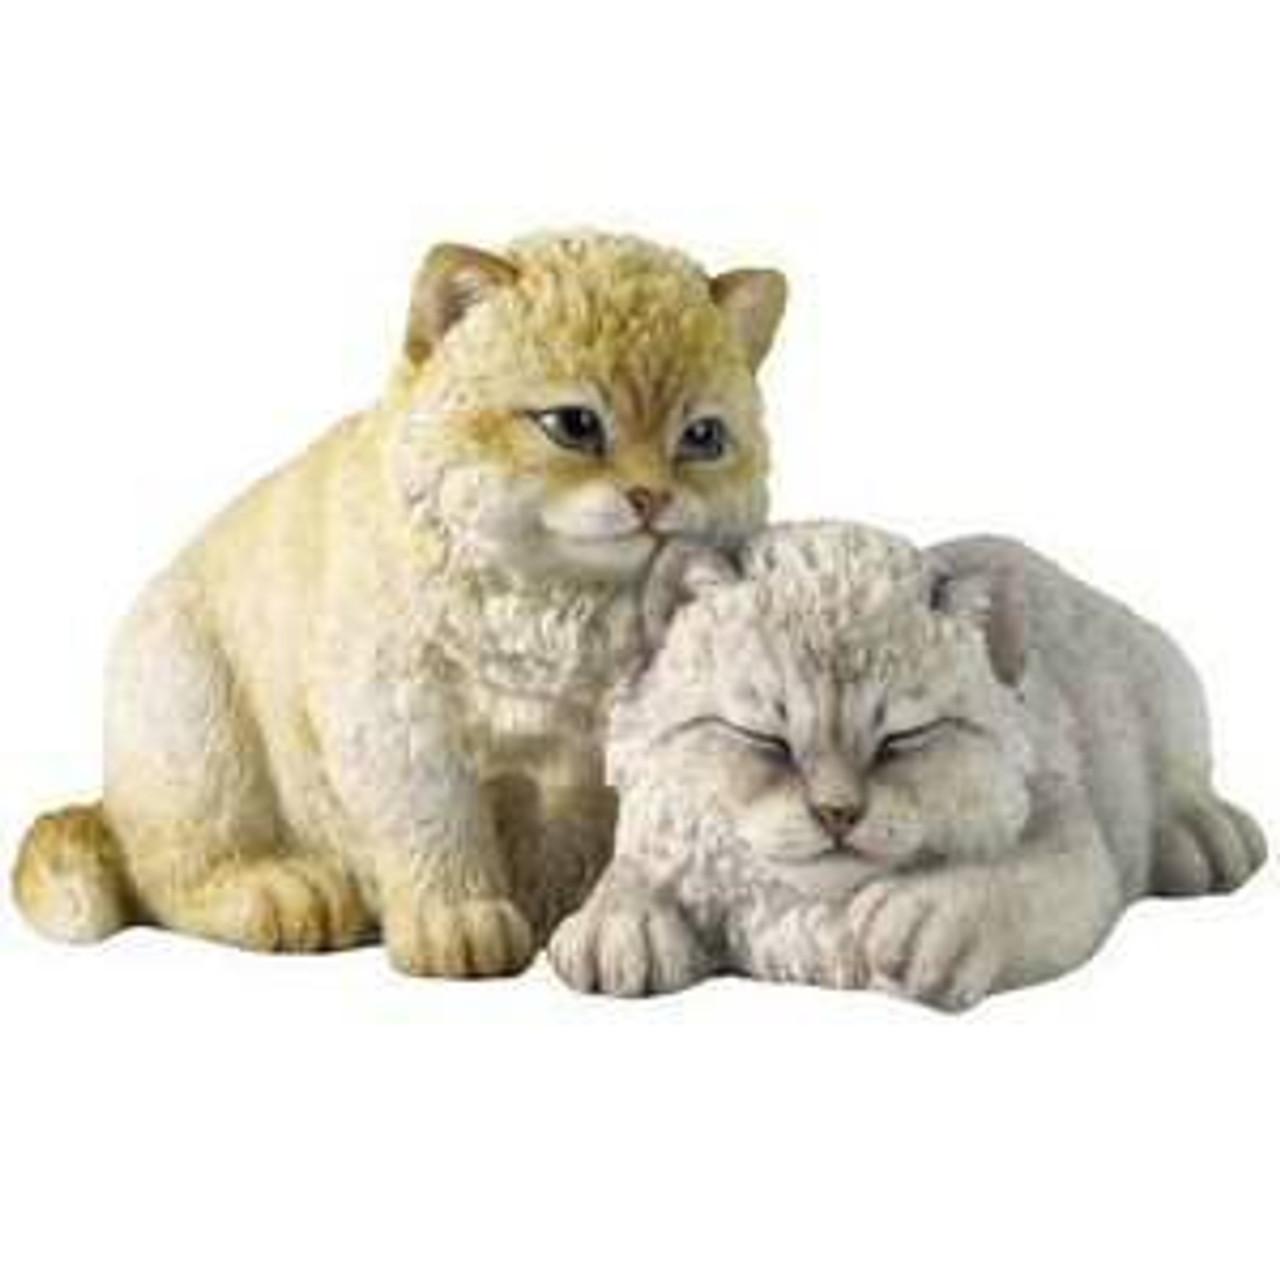 Cat Sculptures